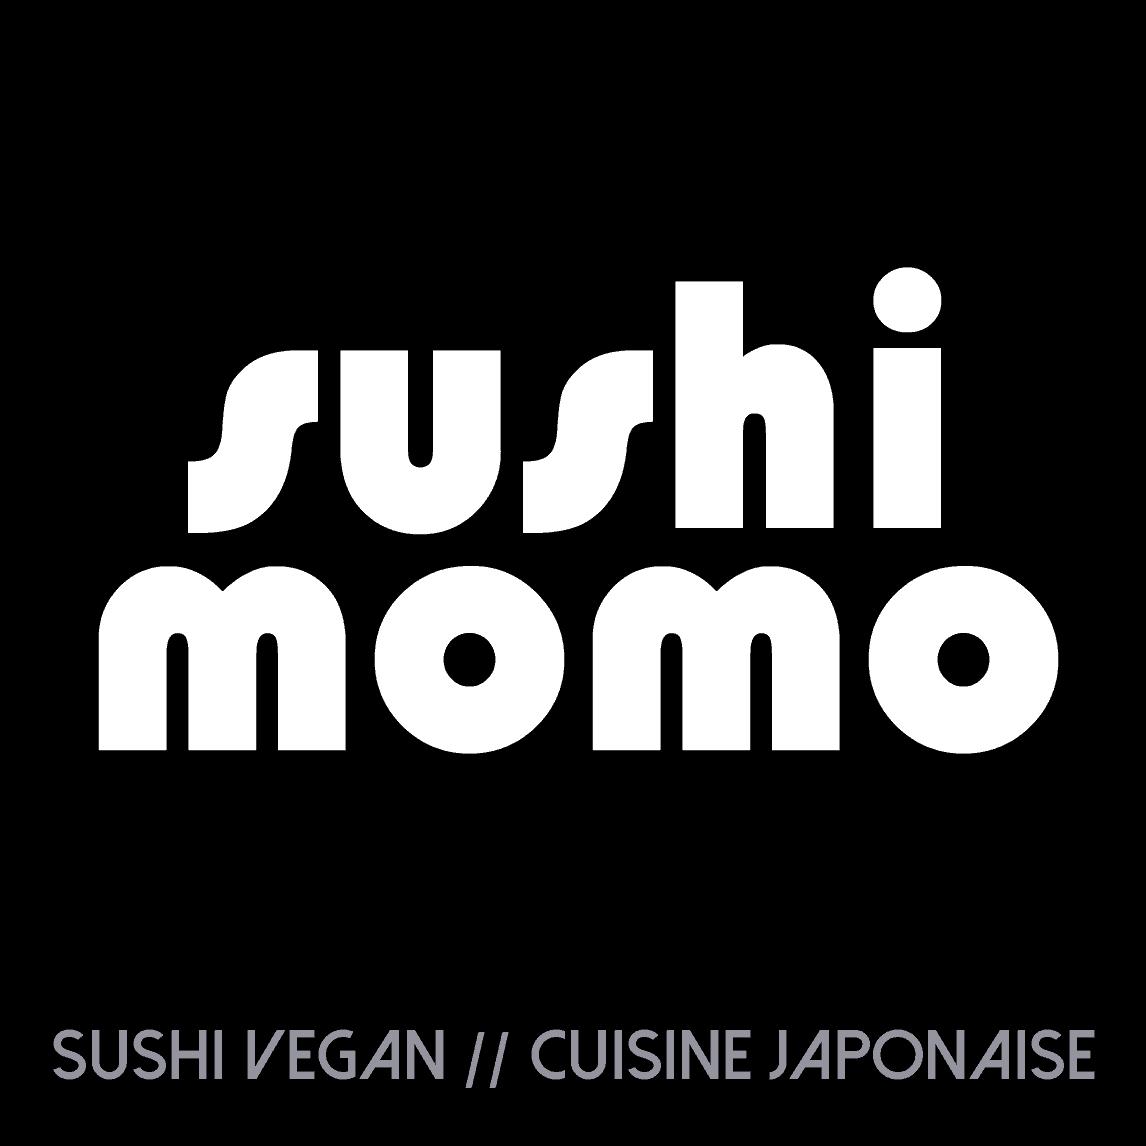 Sushi Momo Végétalien